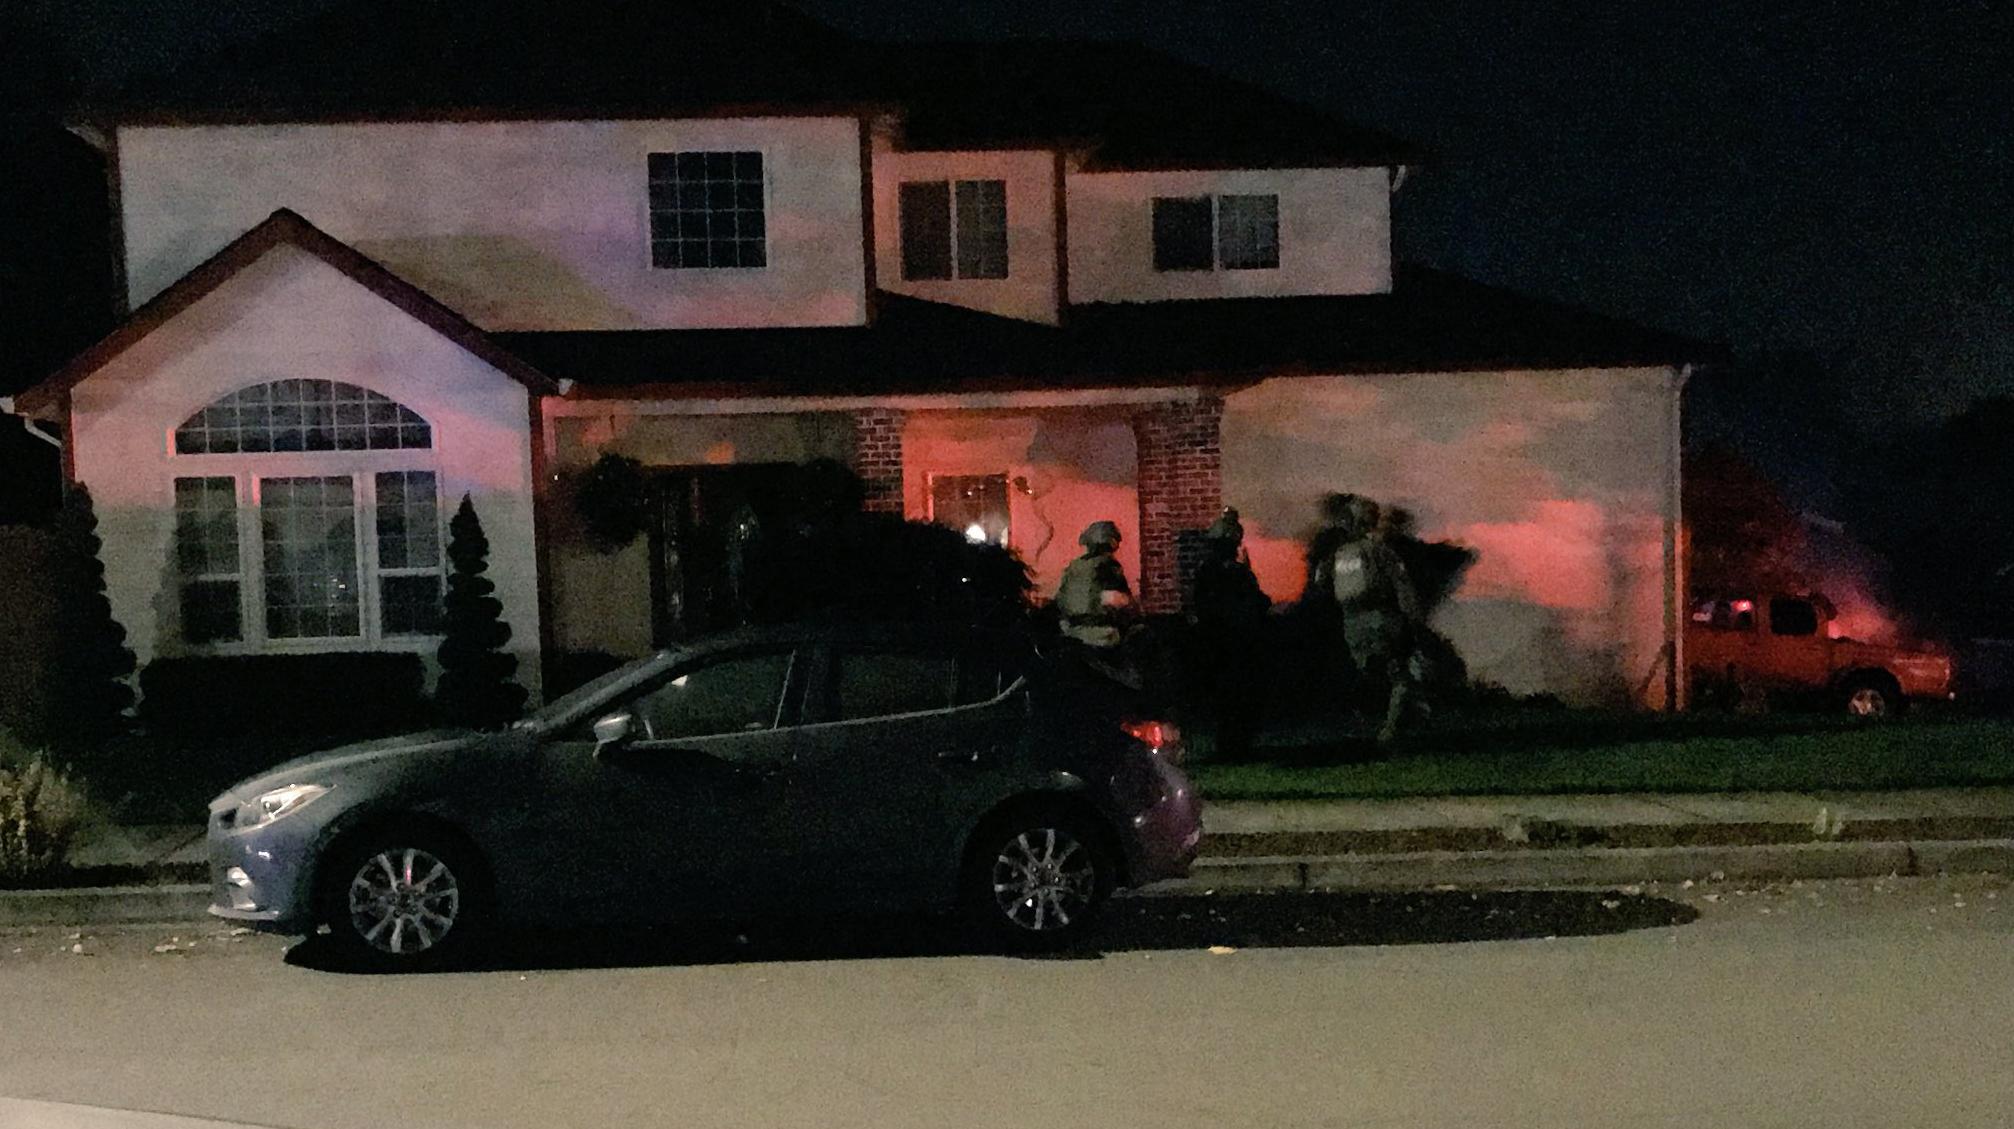 Murdered woman's husband found dead in Hillsboro home